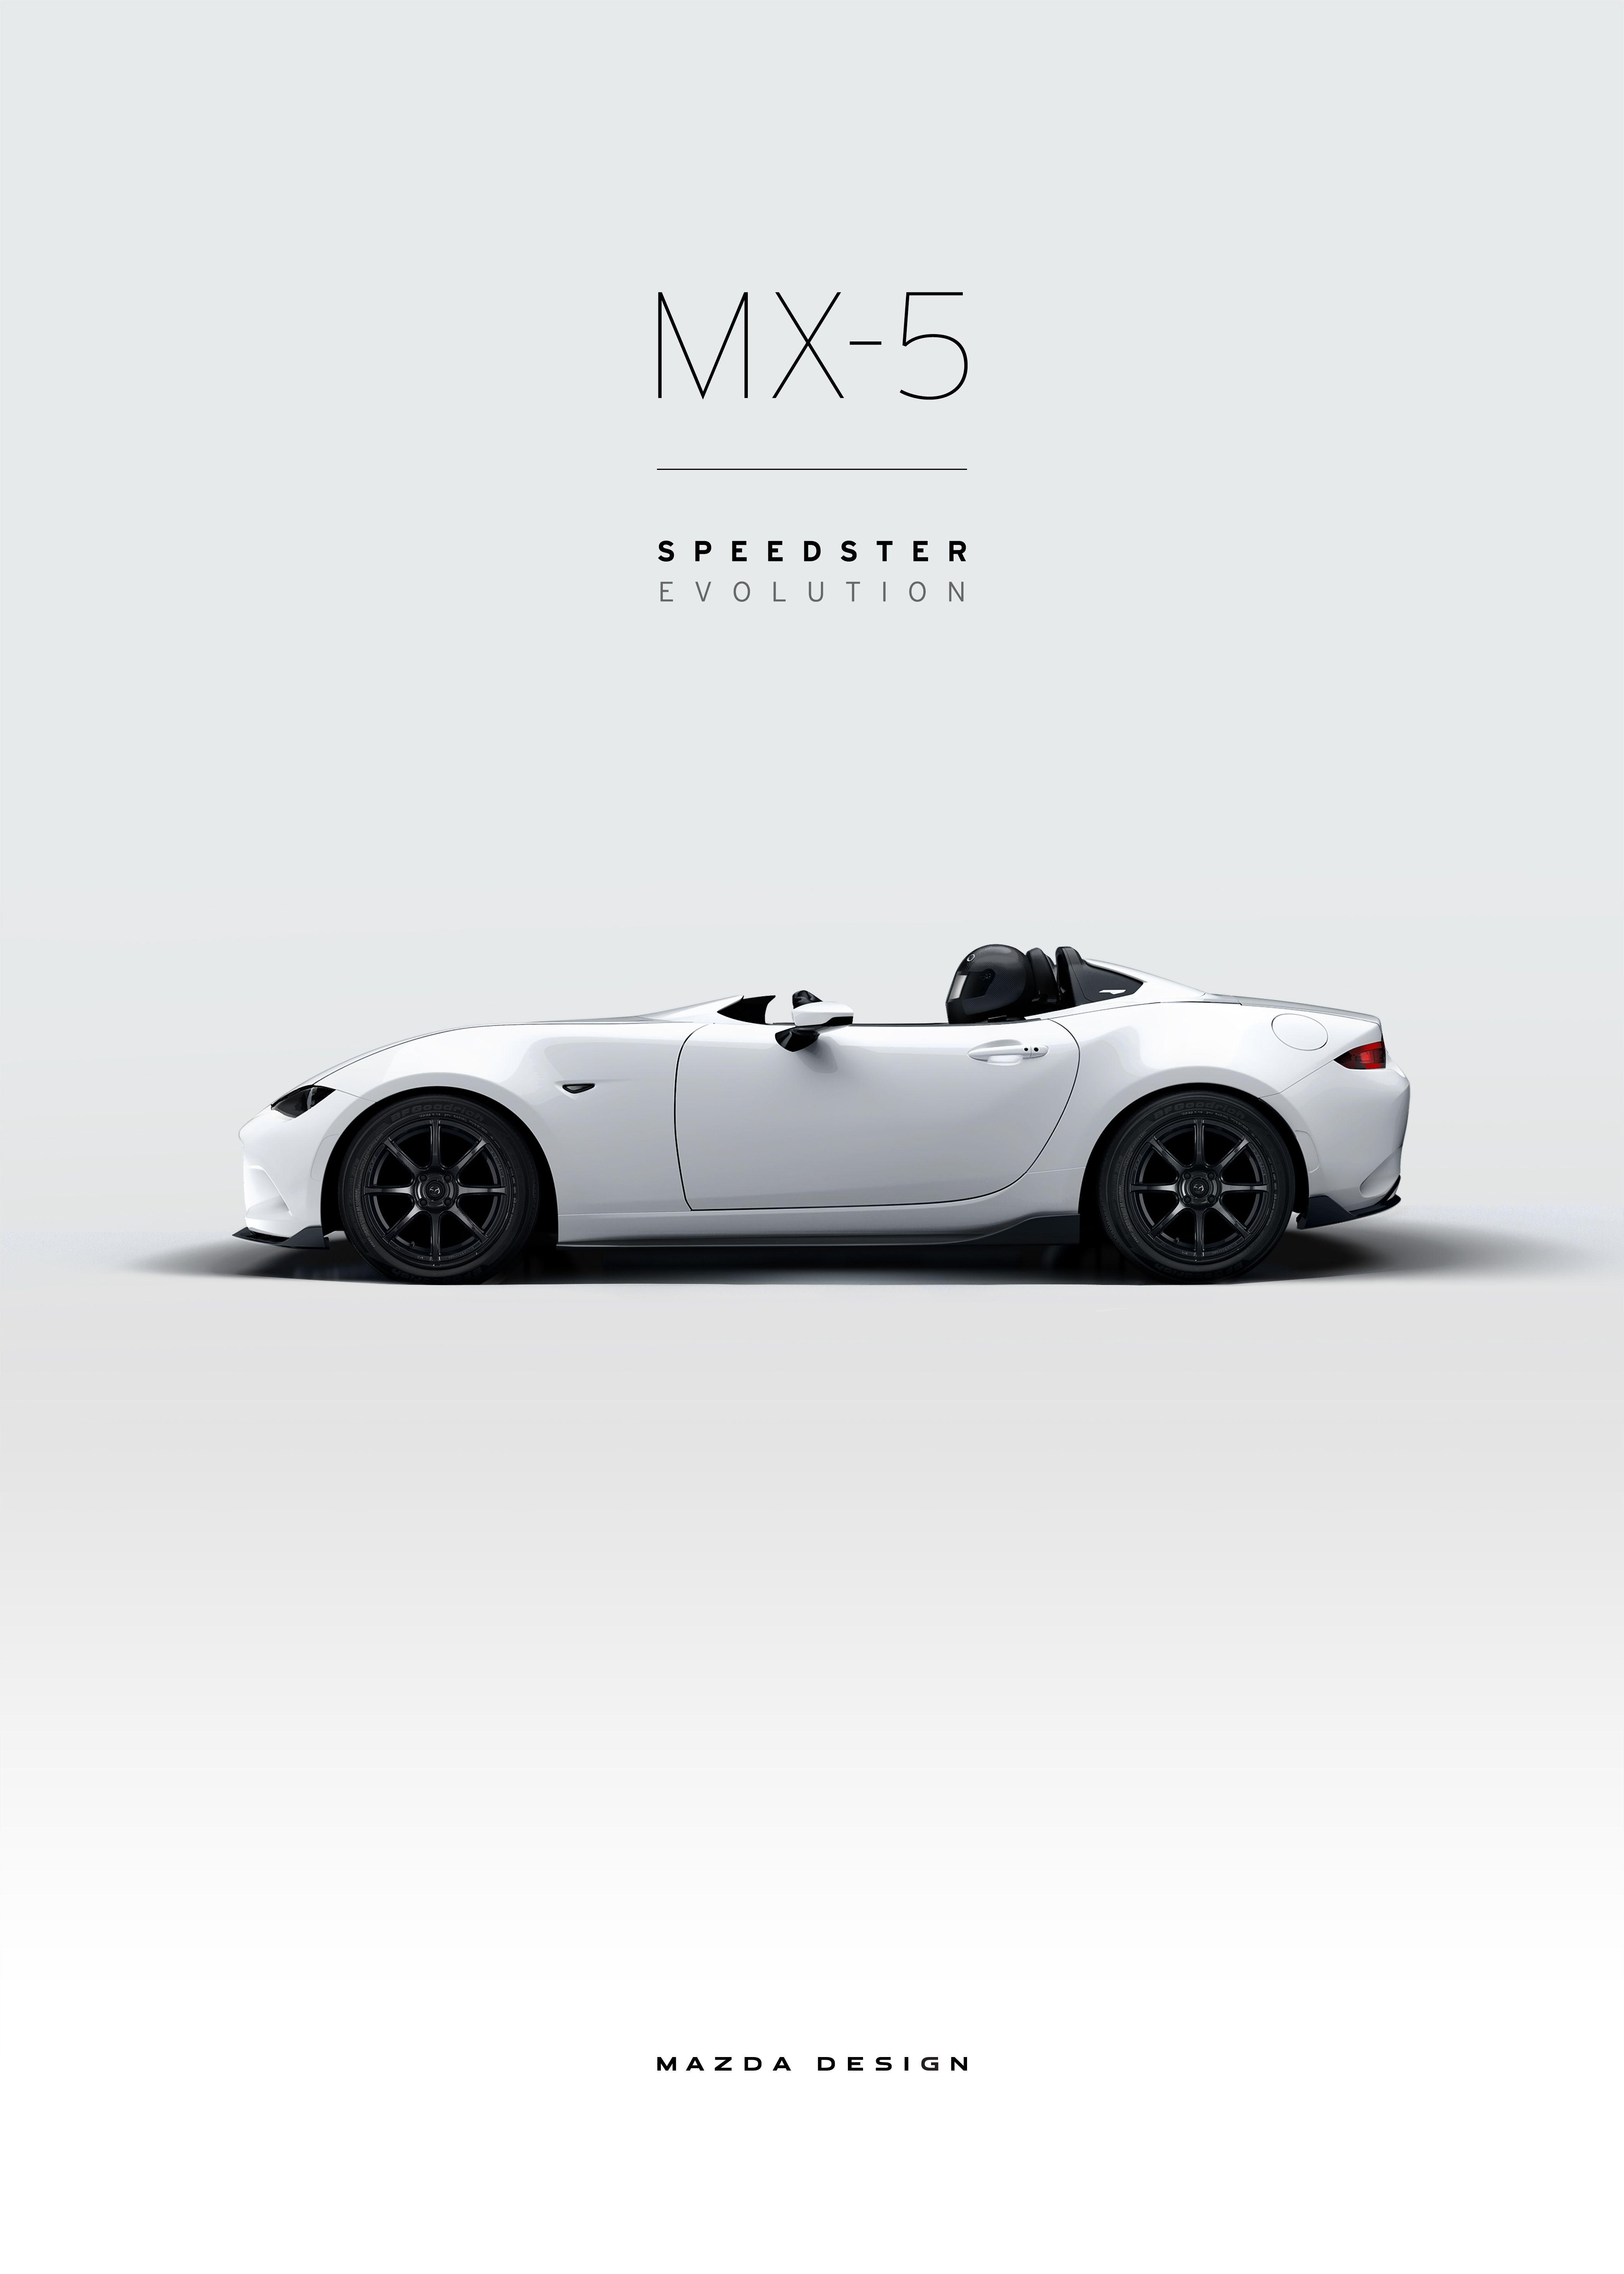 Motor\'n | MAZDA PREVIEWS 2016 SEMA CONCEPTS: MX-5 MIATA SPEEDSTER ...